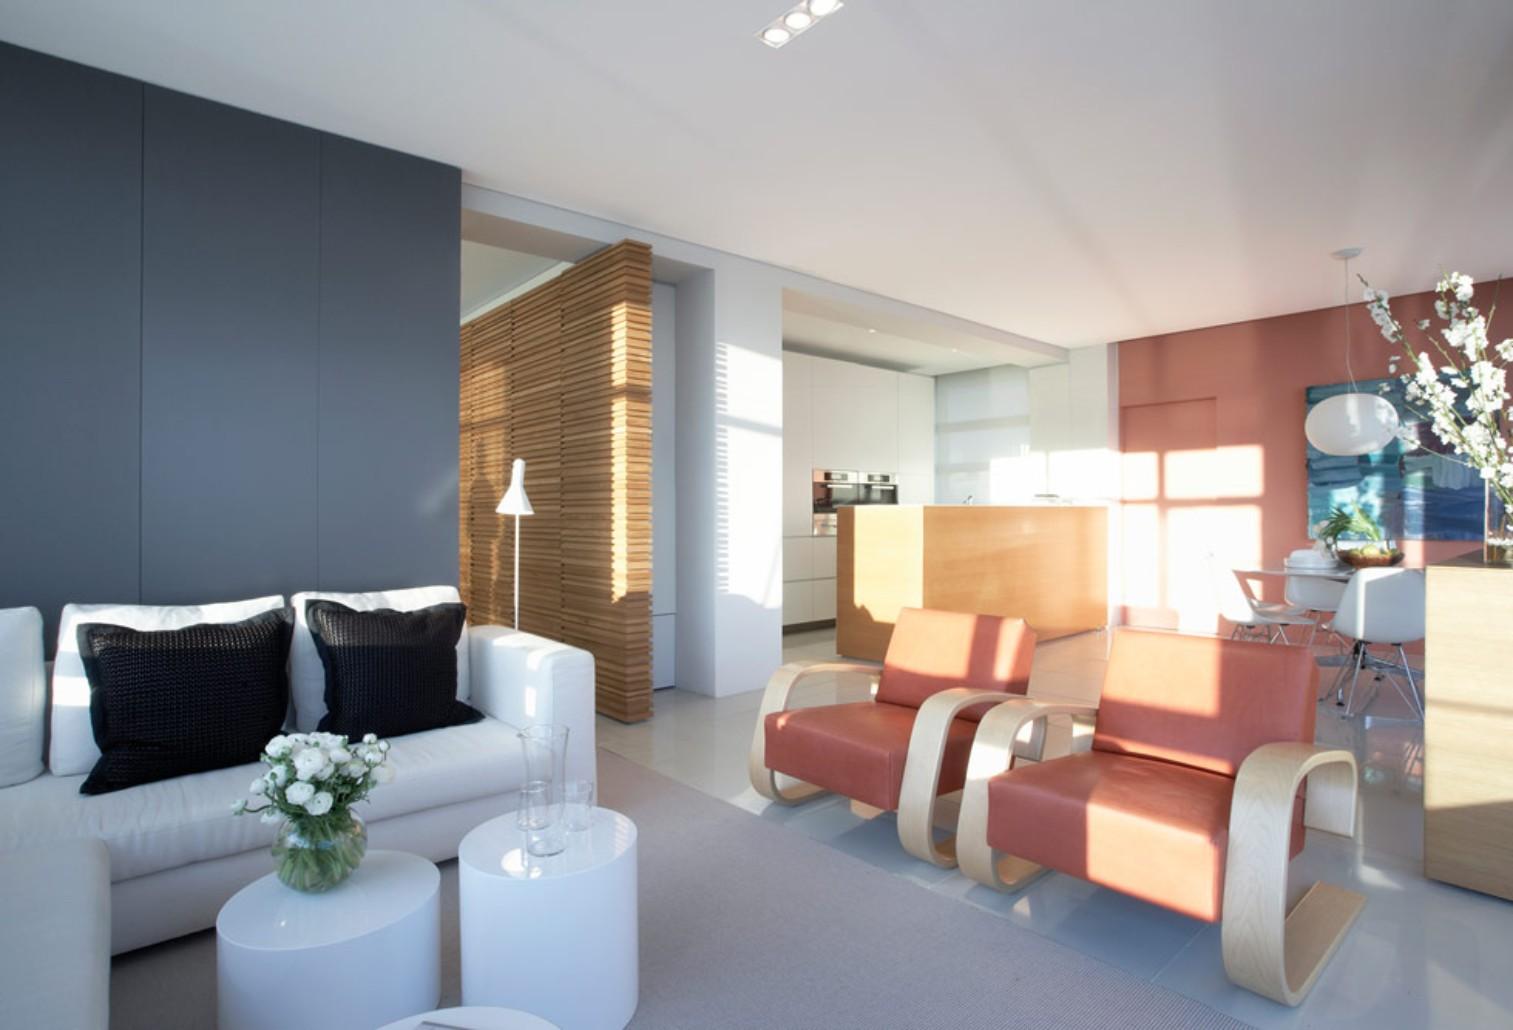 Australian Interior Designers to Beautify your Home australian interior designers Australian Interior Designers to Beautify your Home Australian Interior Designers to Beautify your Home2